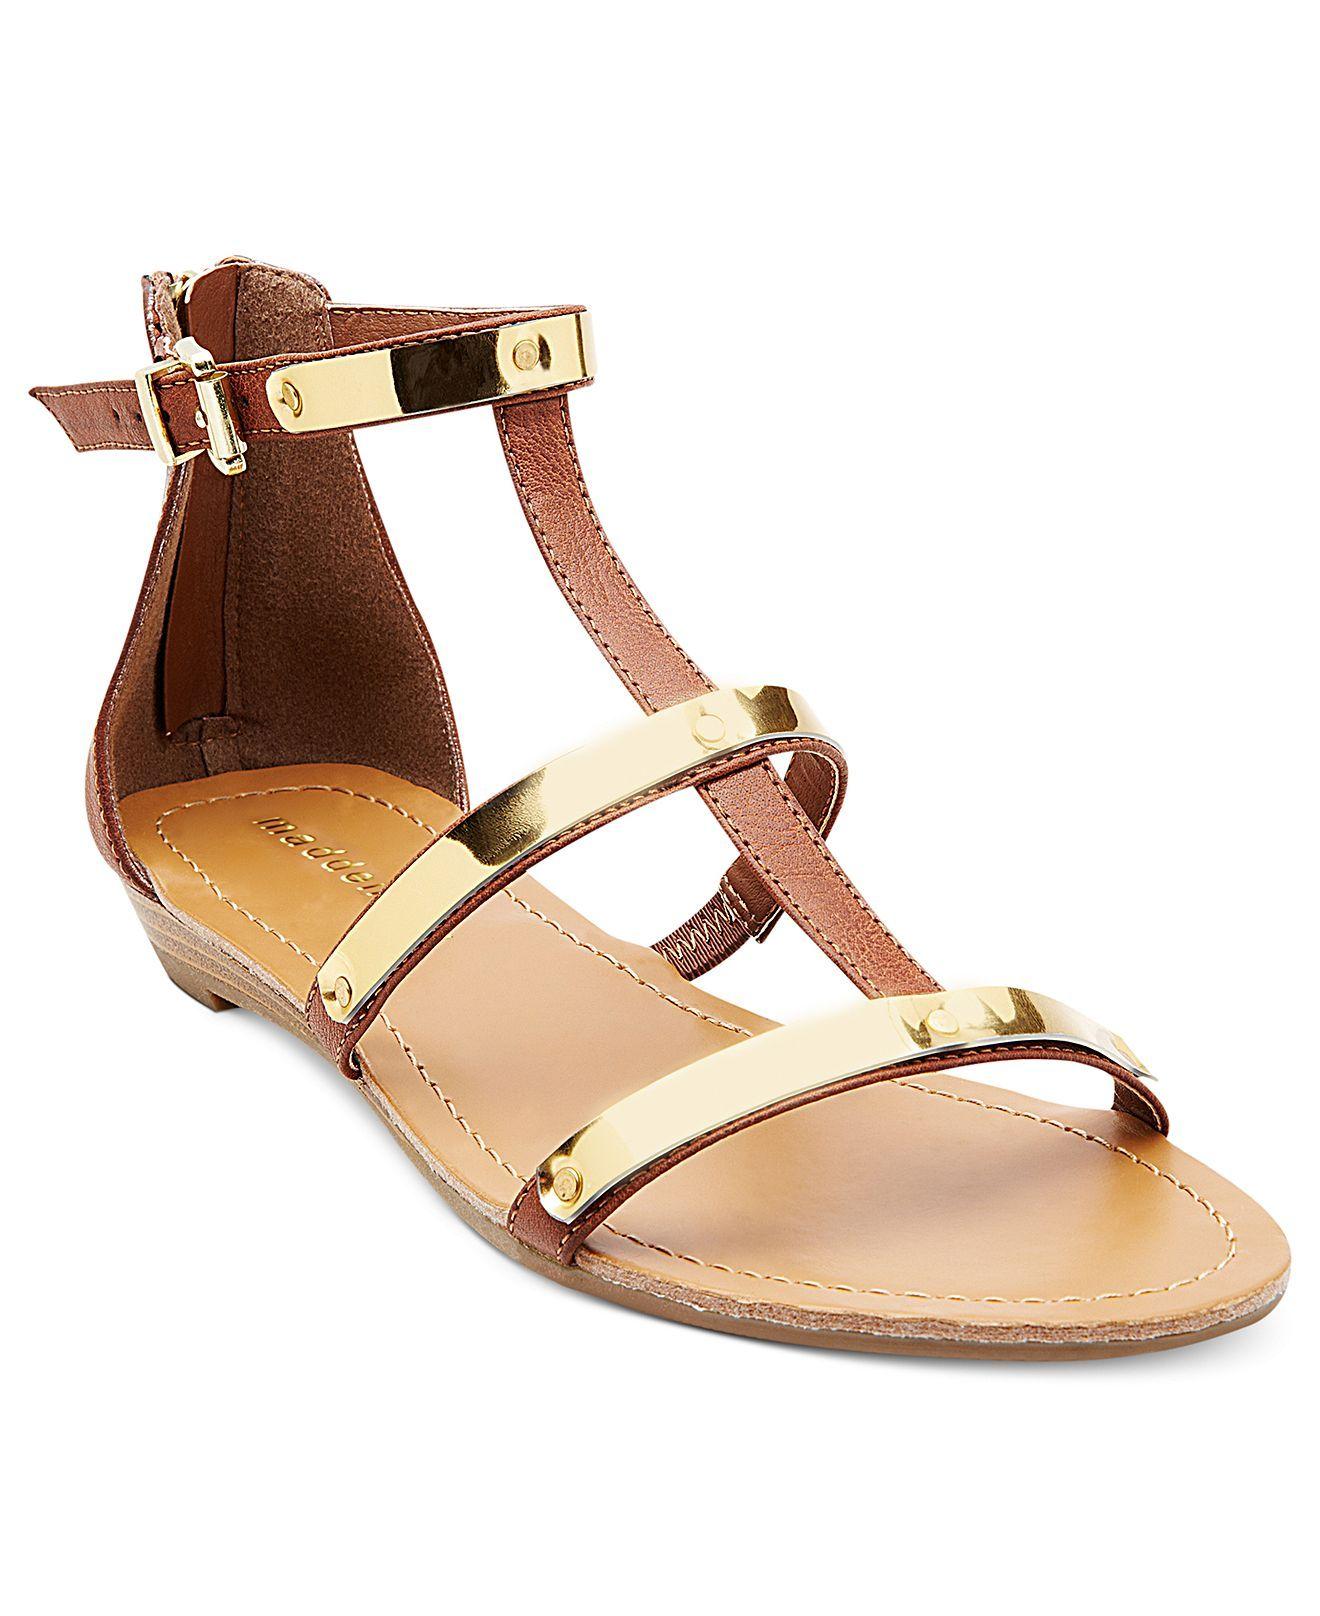 29341c8c8e47 Madden Girl Shoes